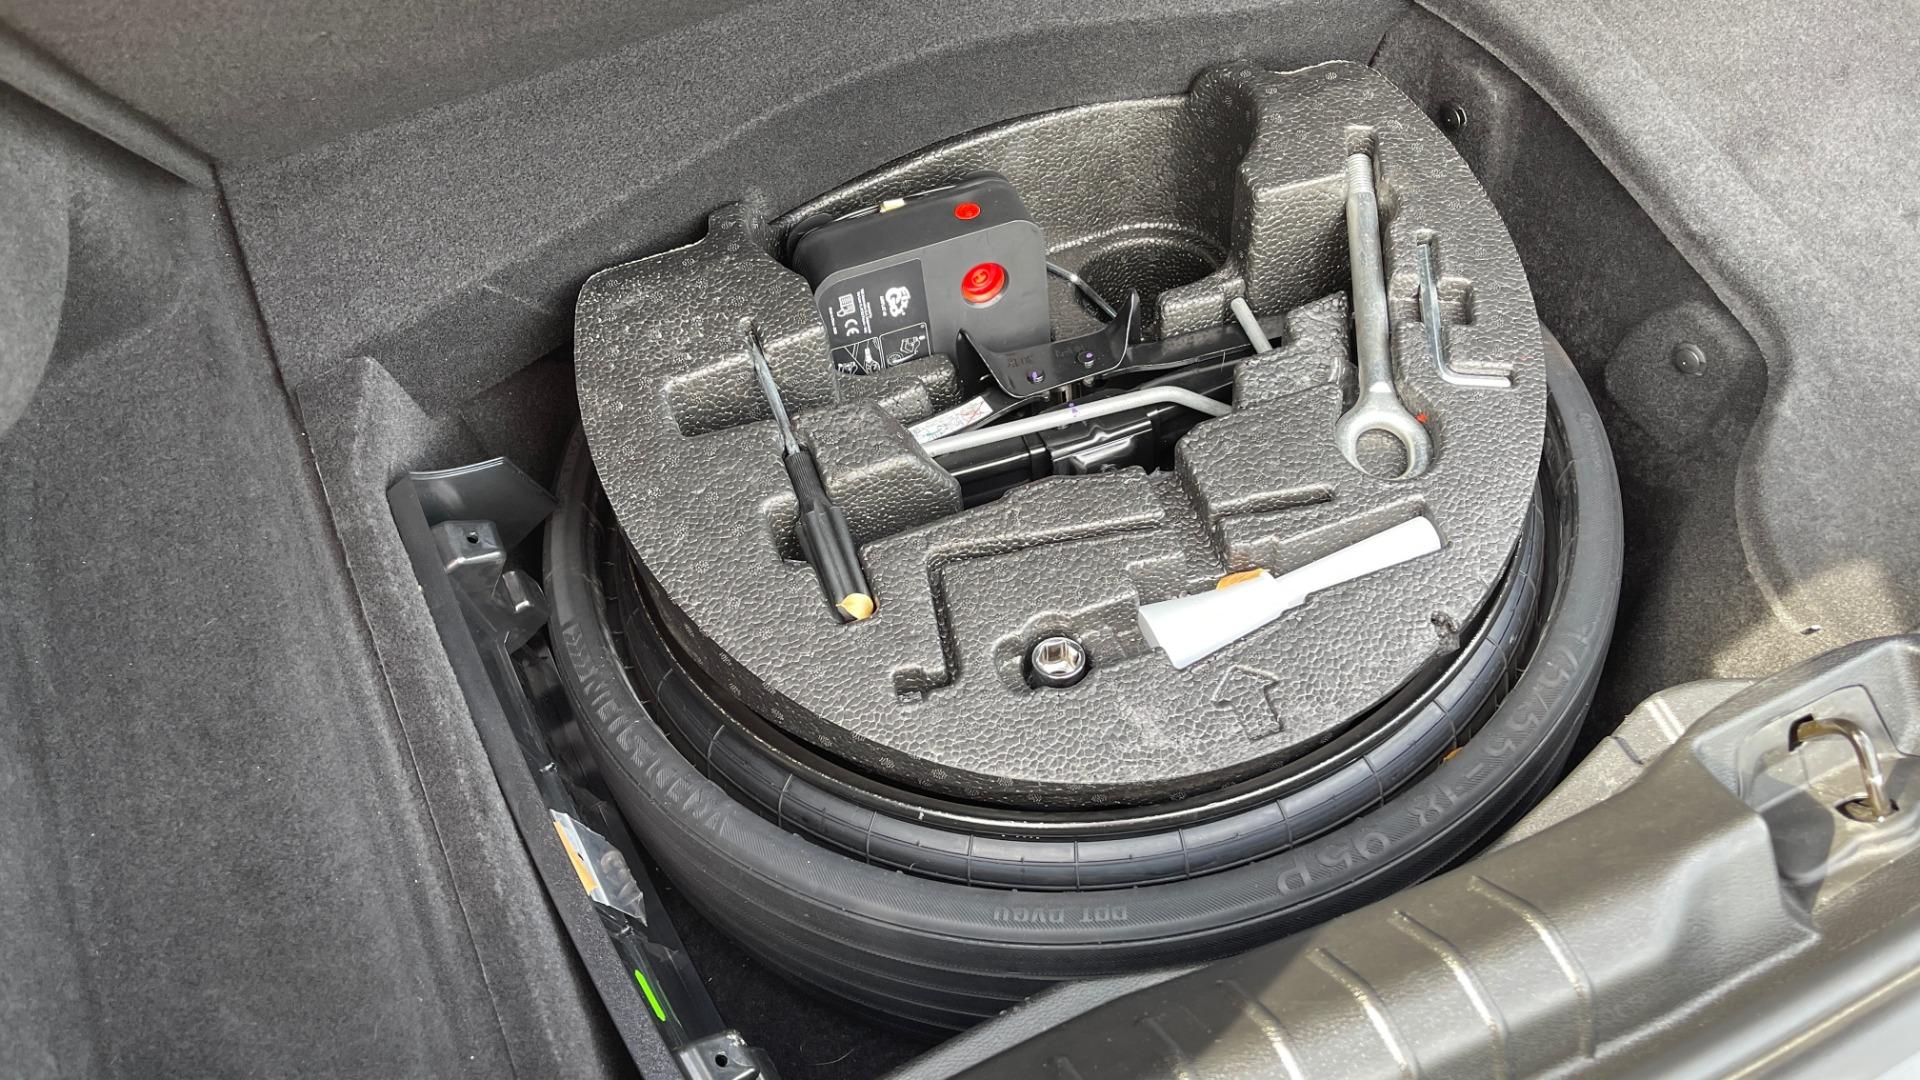 Used 2018 Maserati GHIBLI 3.0L SEDAN / 8-SPD AUTO / NAV / SUNROOF / REARVIEW for sale $42,995 at Formula Imports in Charlotte NC 28227 23